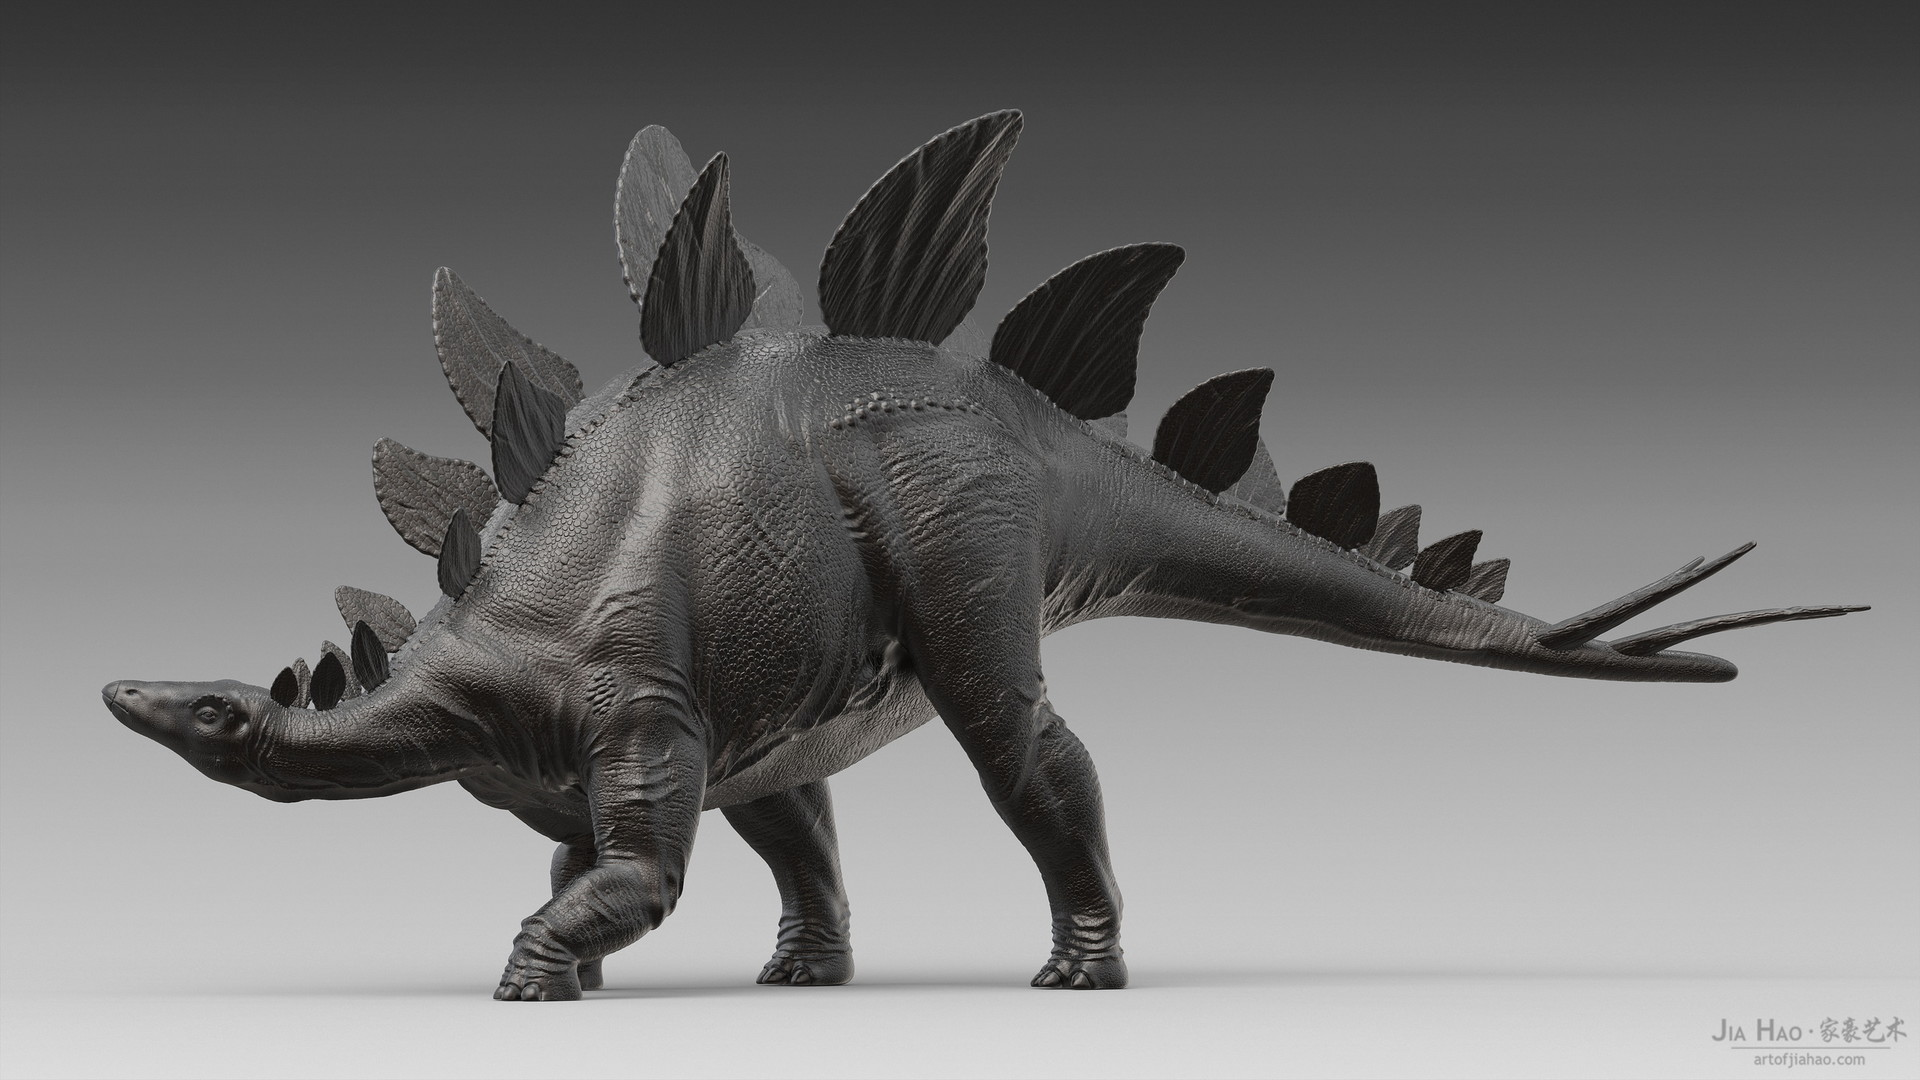 Jia hao stegosaurus digitalsculpture 02